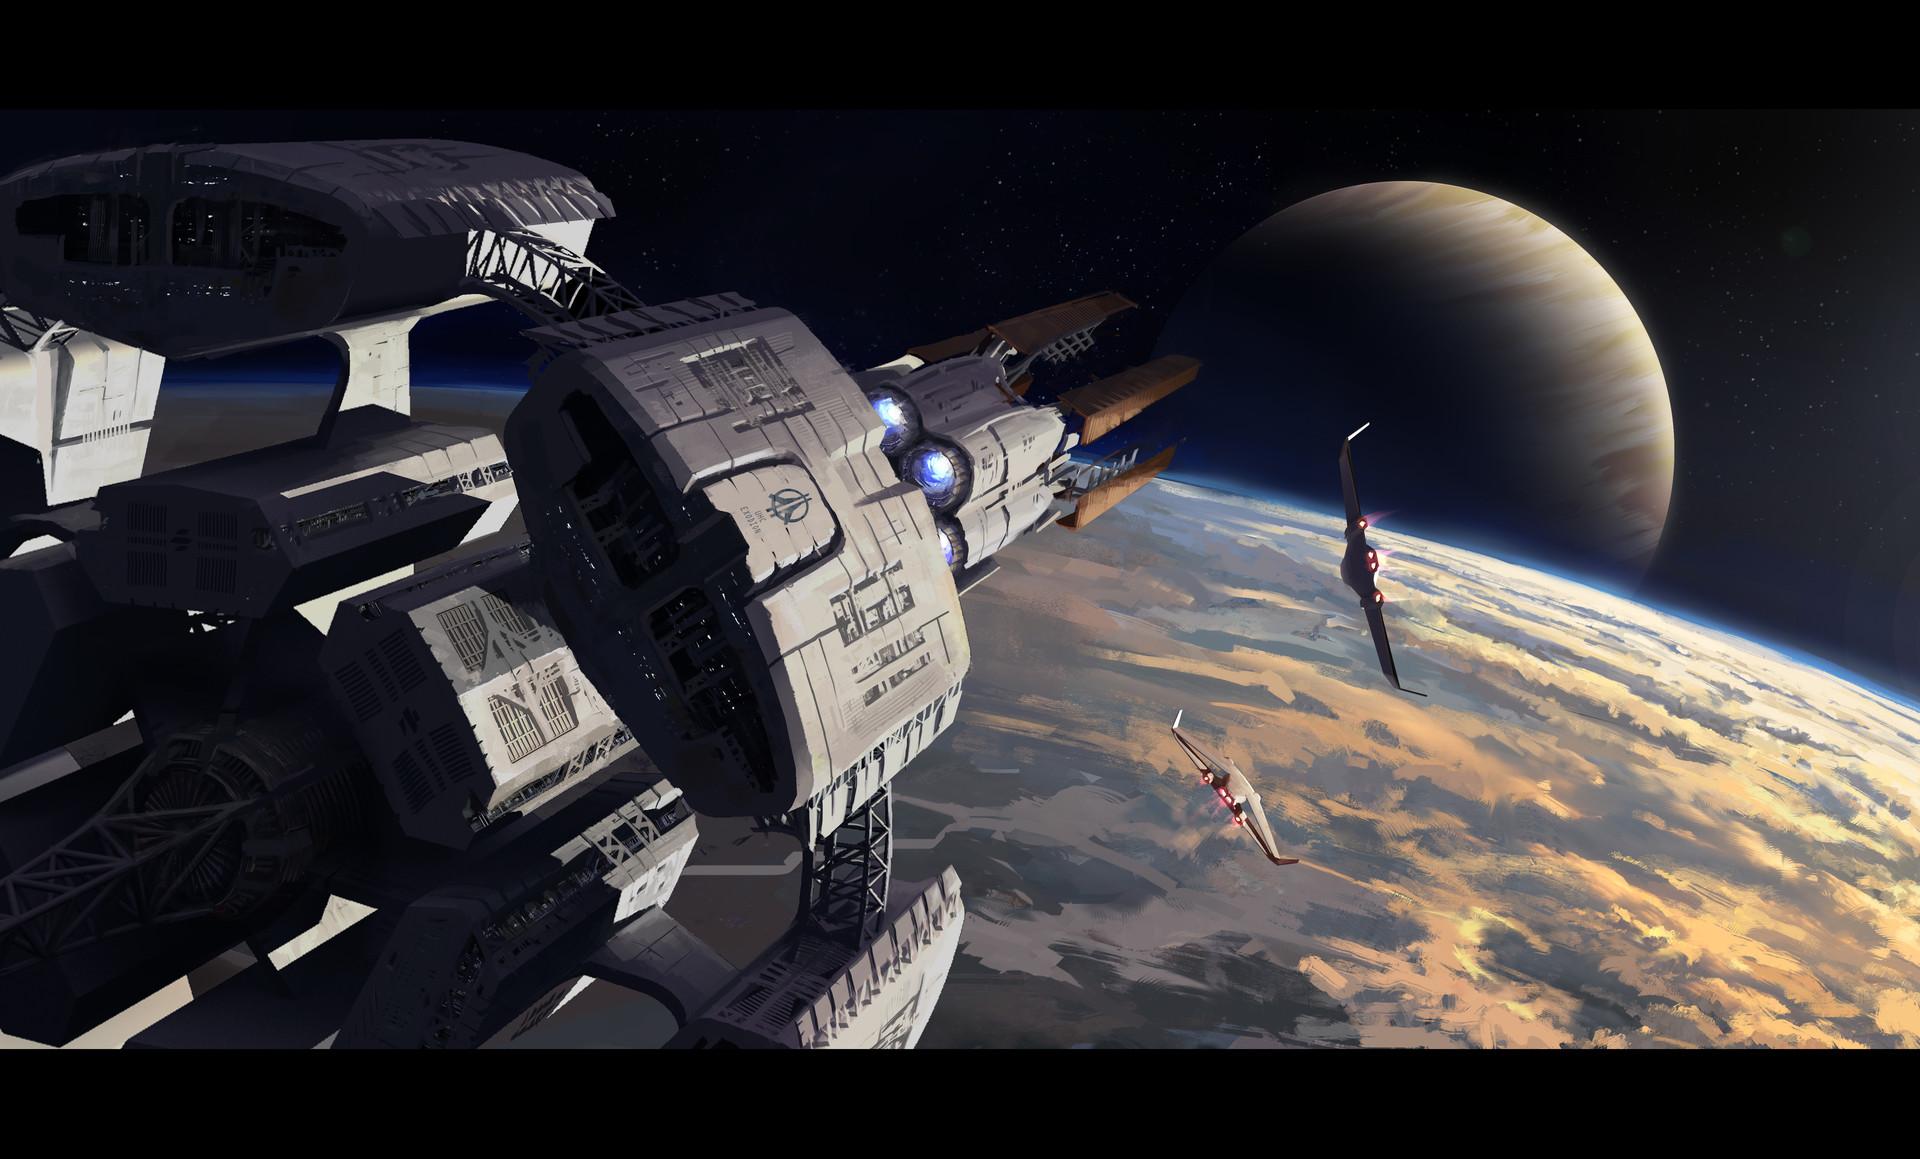 Trapaski, mondes lointains en construction Jerome-lalande-efkaria-exodus-finalv2